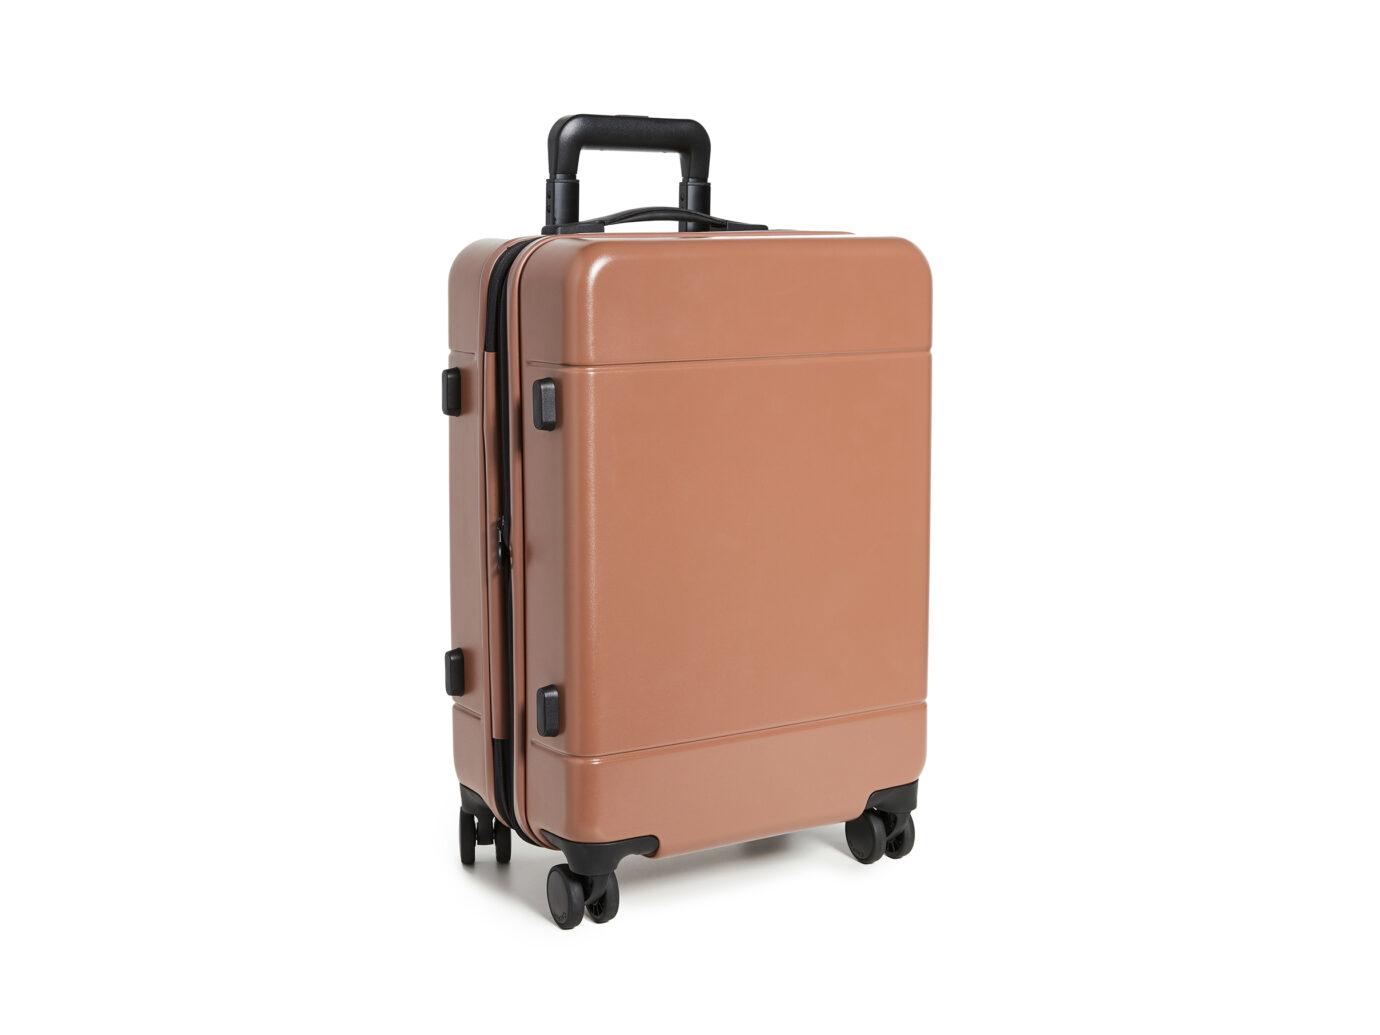 CALPAK 20-Inch Carry-On Suitcase